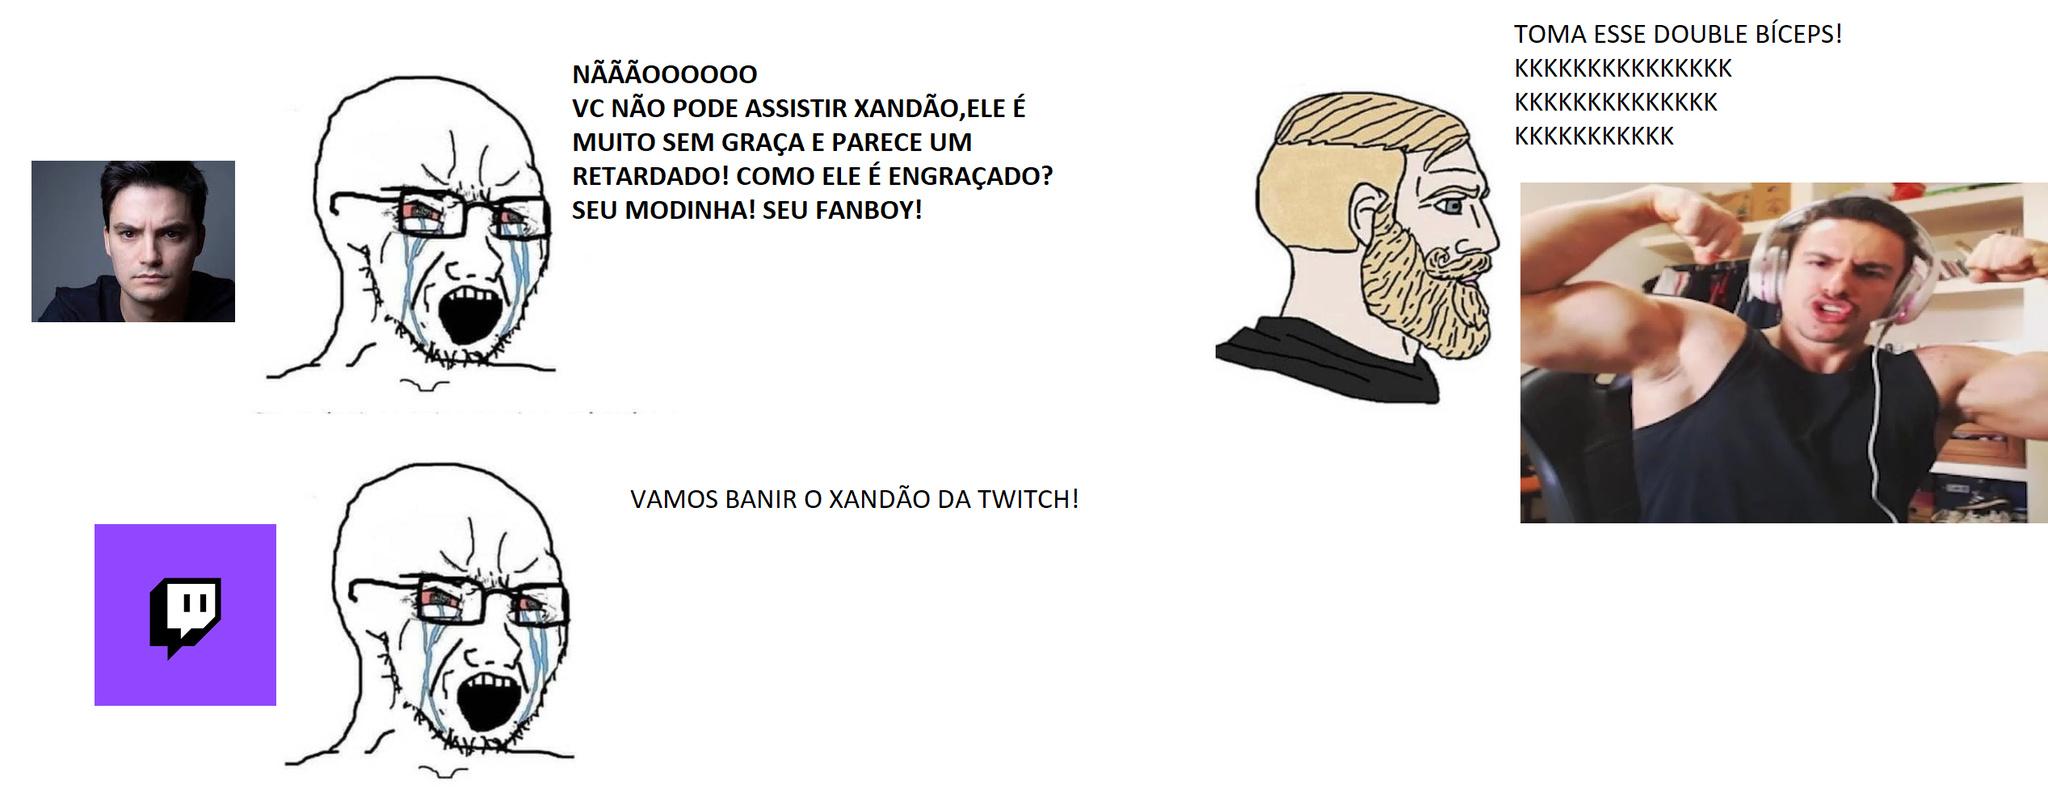 XANDÃO,O ÚLTIMO HERÓI DA TERRA!!! - meme